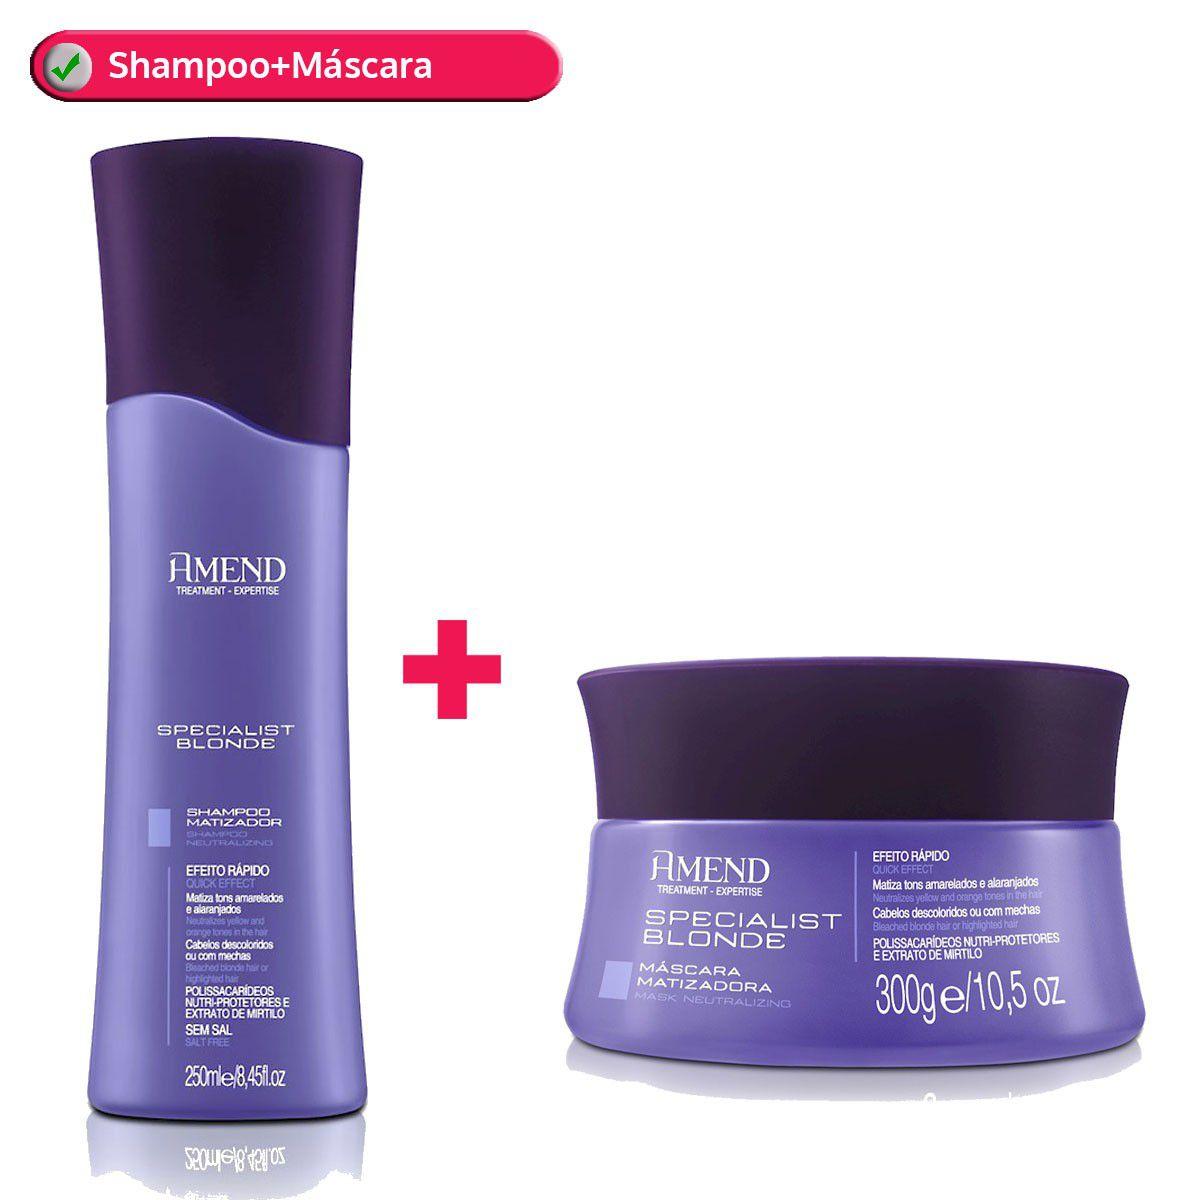 Kit Shampoo Matizador 250g+Máscara Matizadora 300g Specialist Blonde Amend